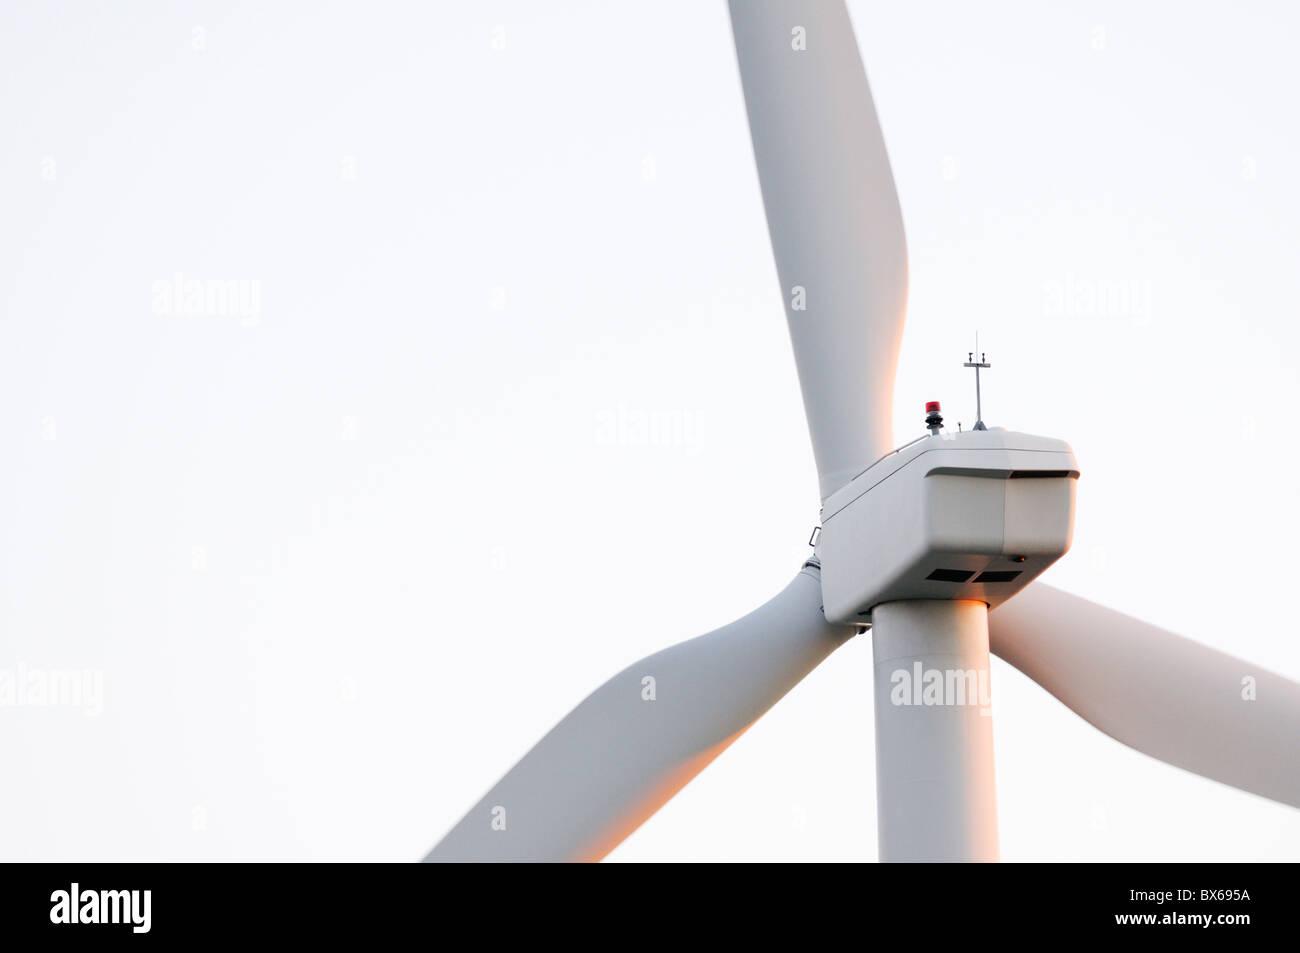 Cerca de aerogeneradores Imagen De Stock